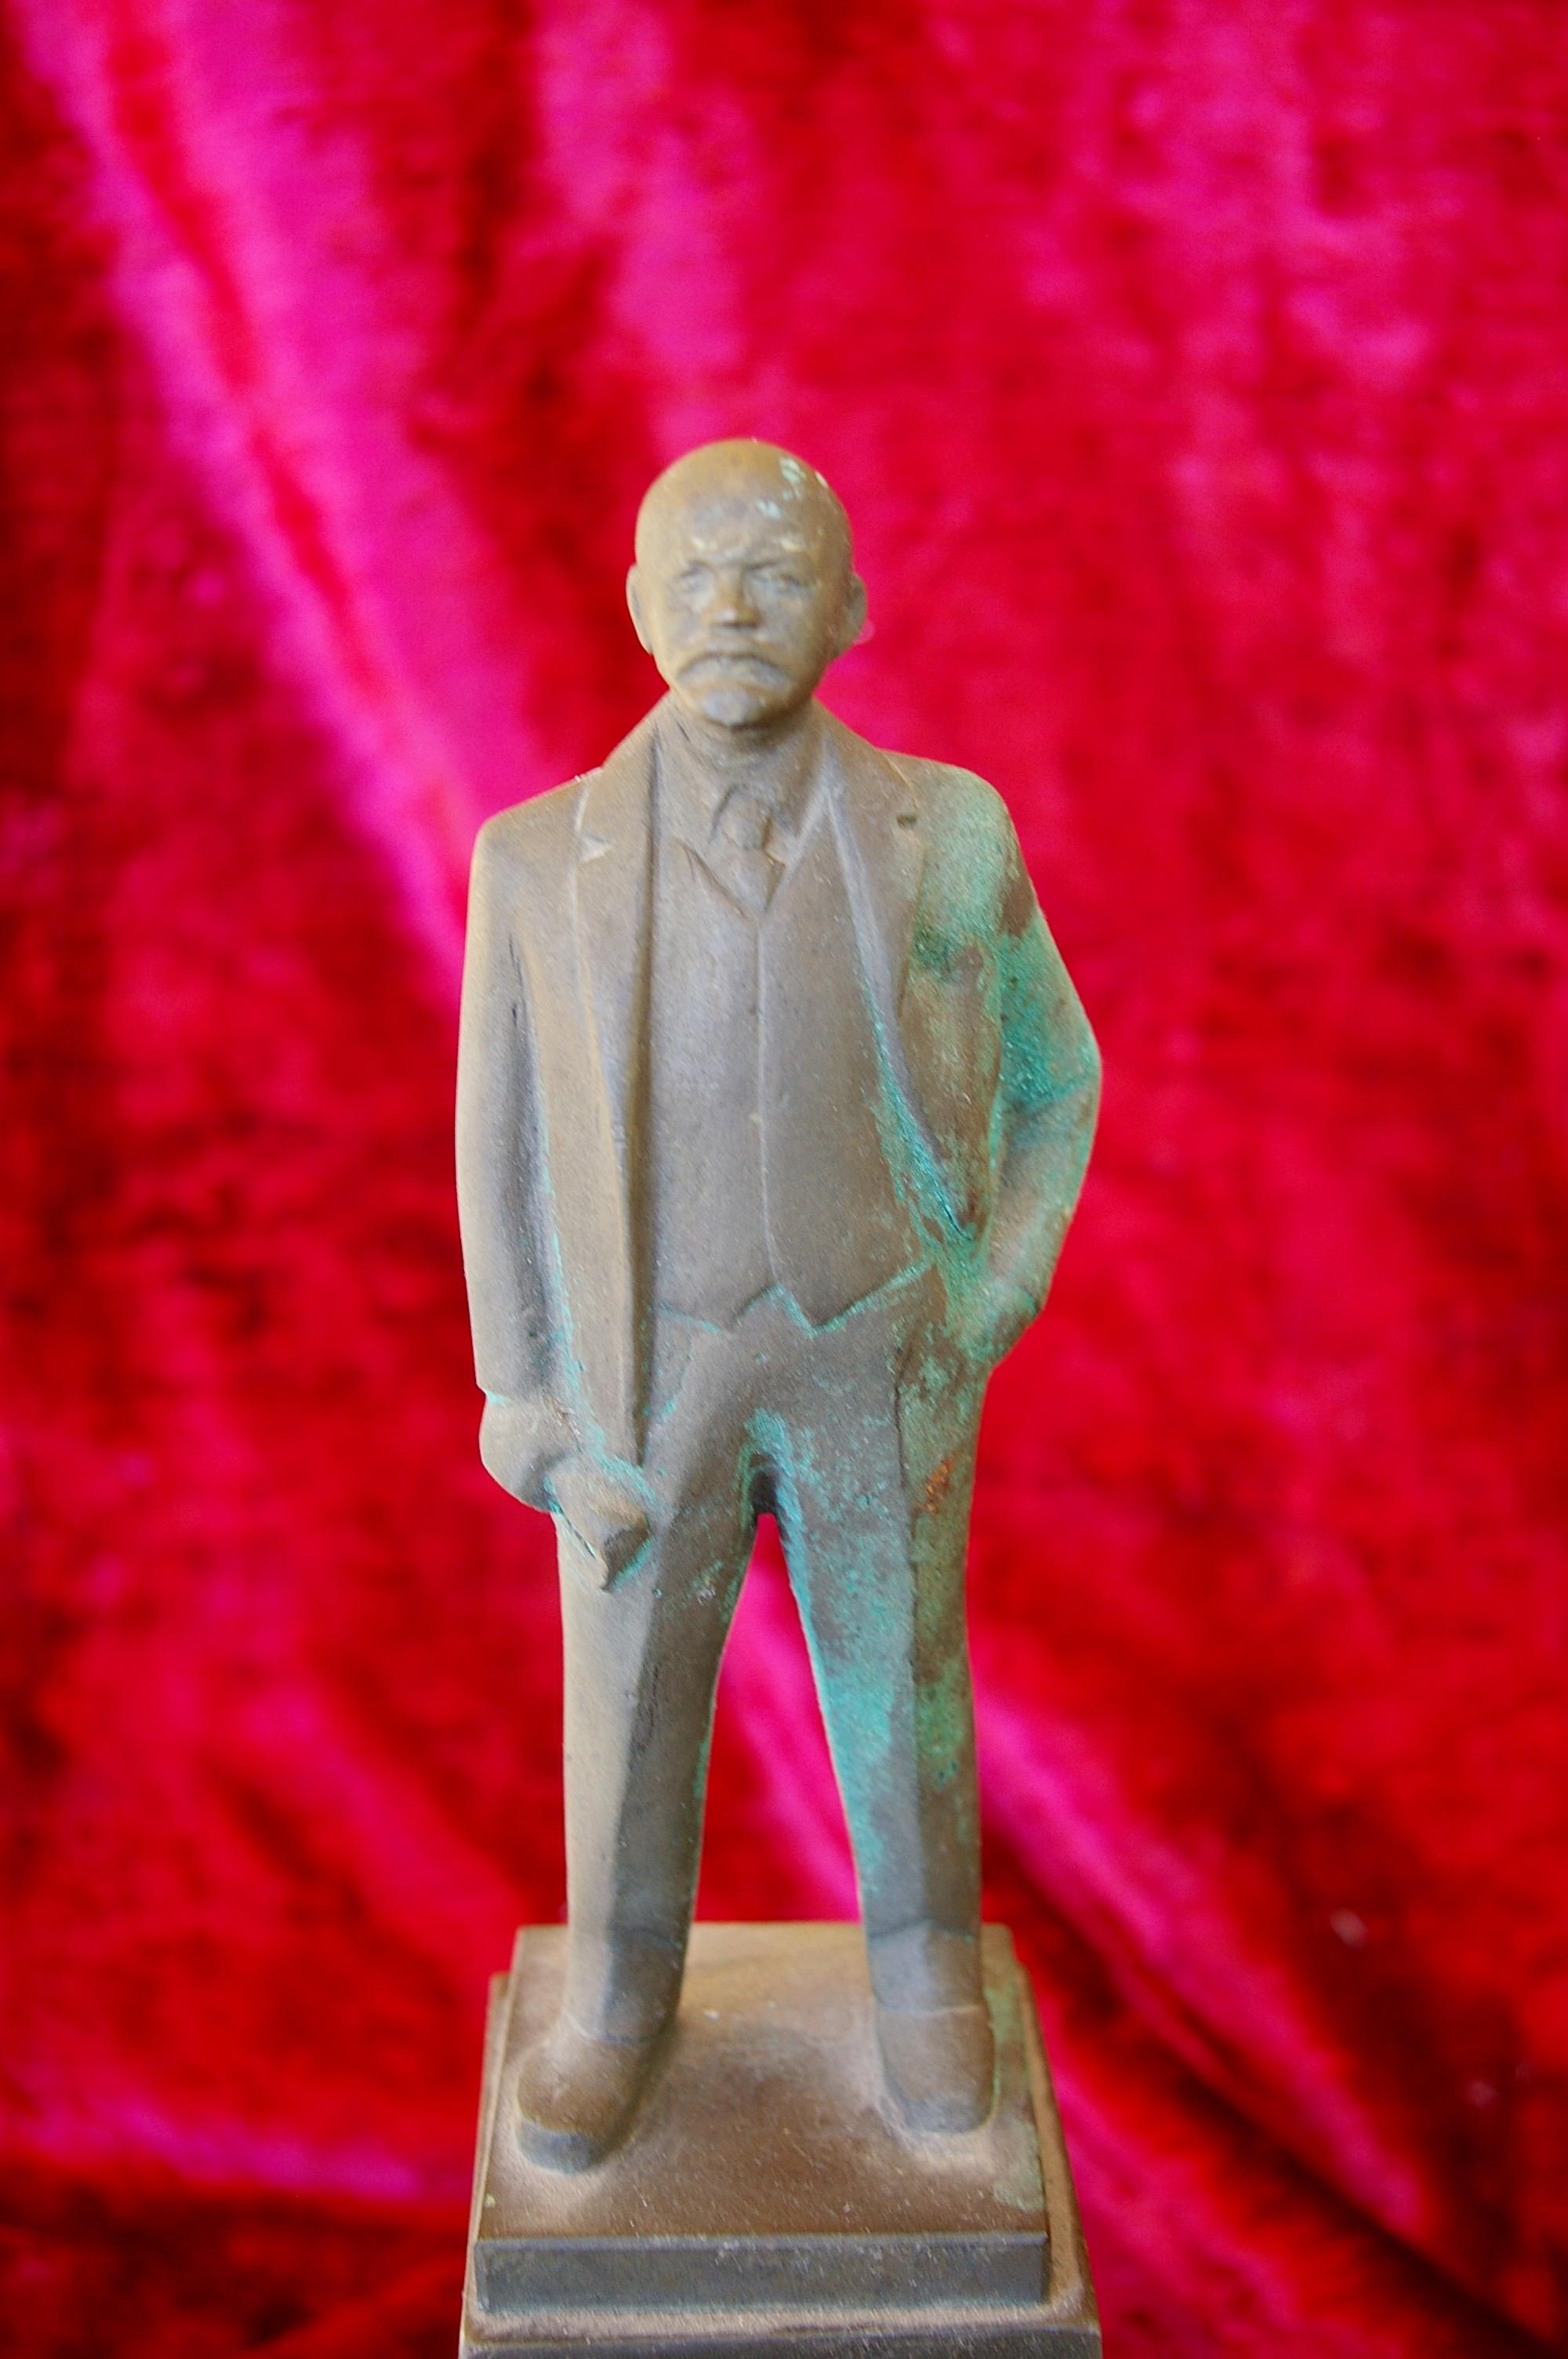 Скульптура Ленин на постаменте, материал бронза, высота 35 см., ширина 20 см., длина 20 см. - 4